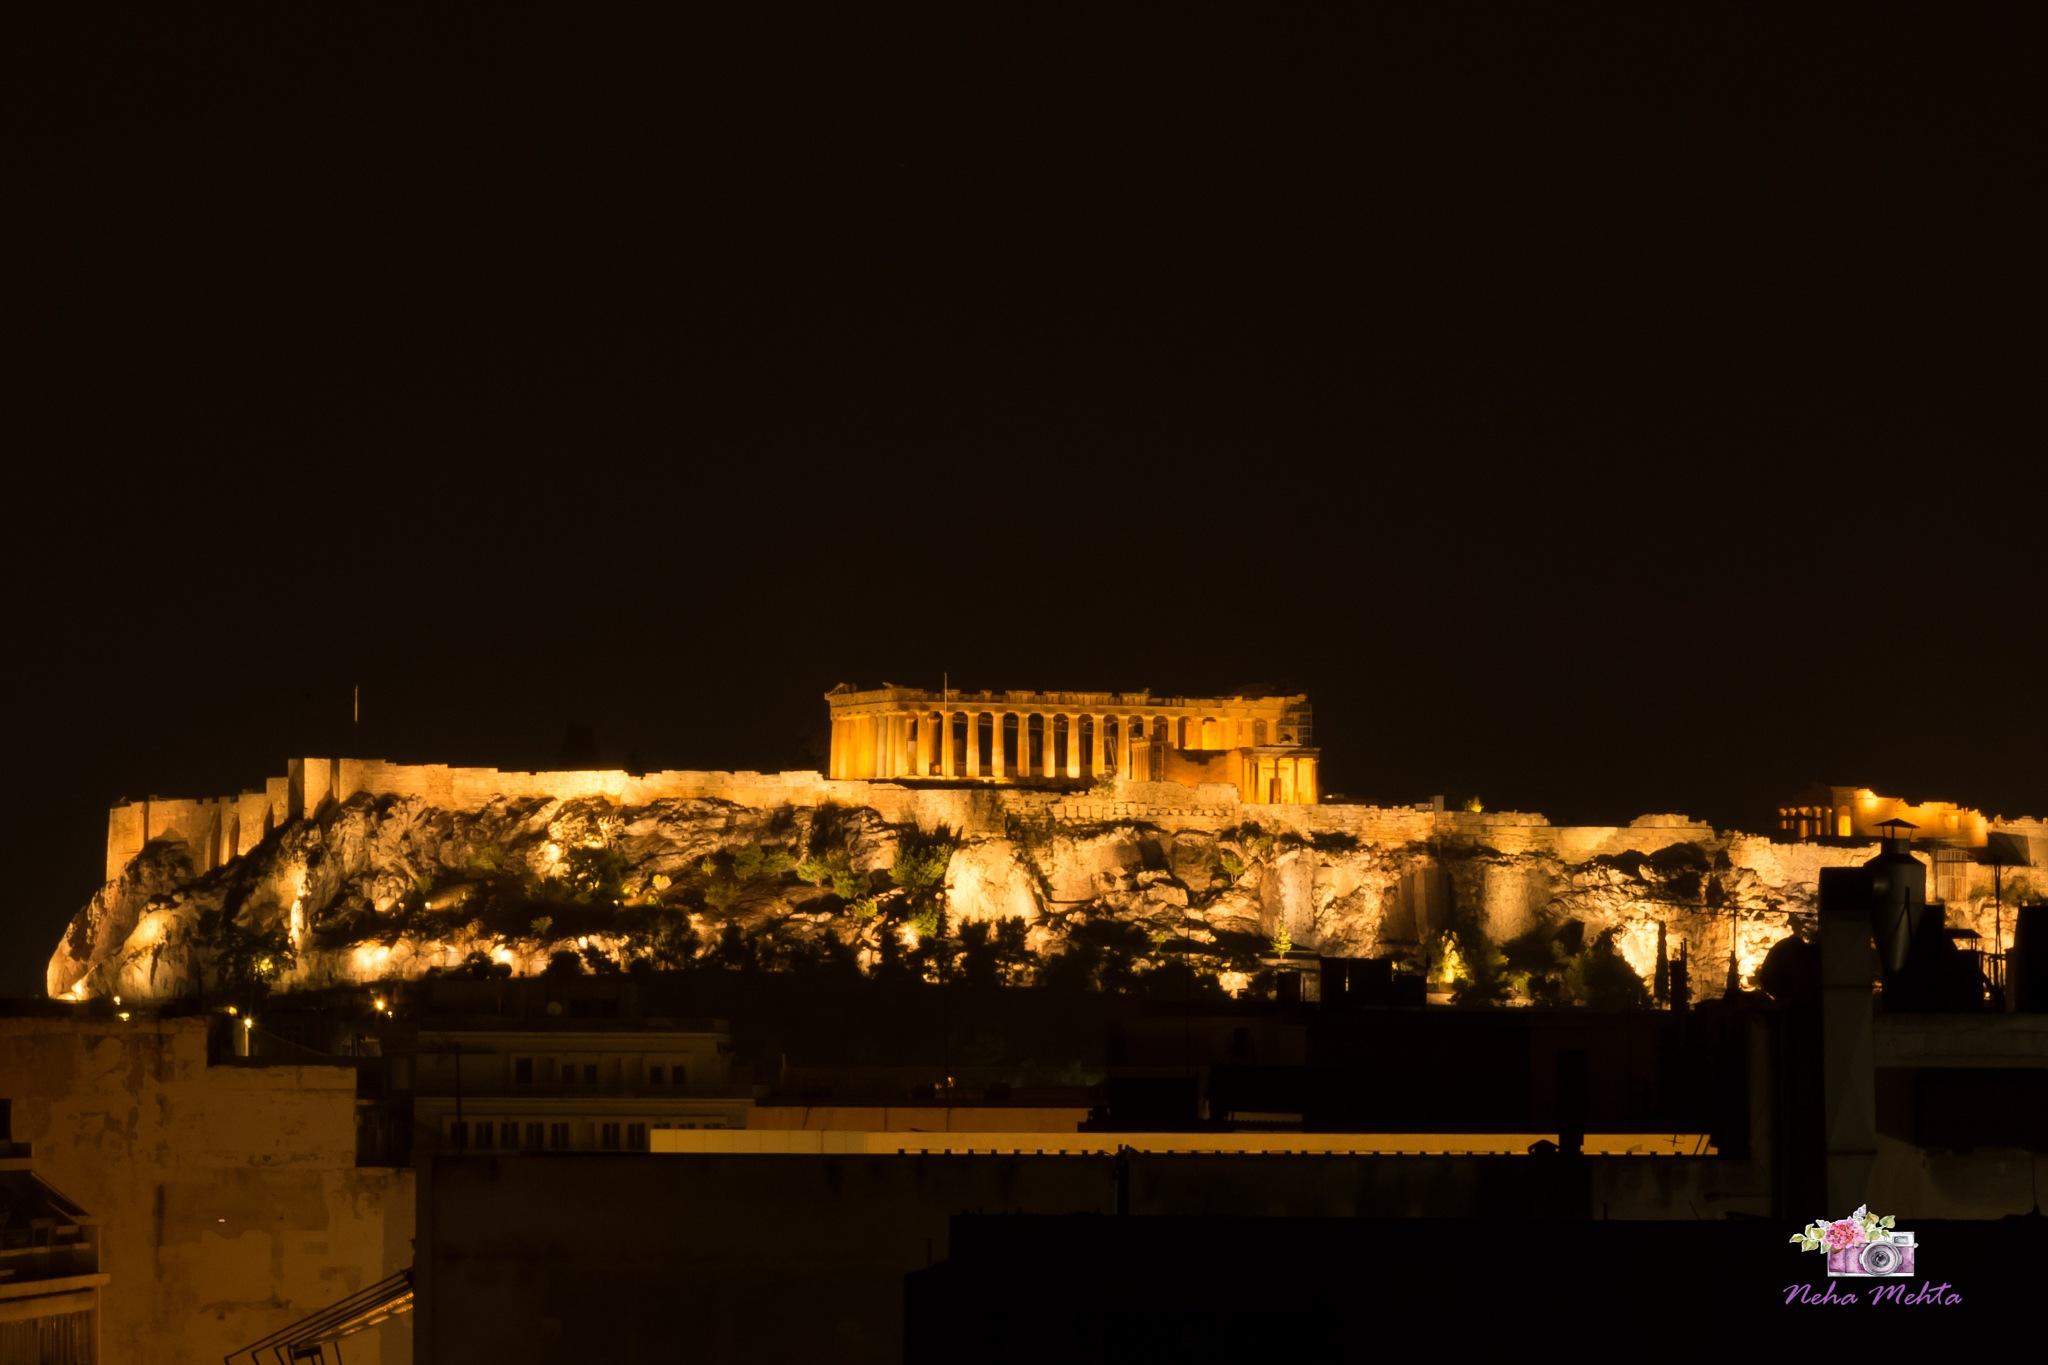 acropolis by Neha Mehta